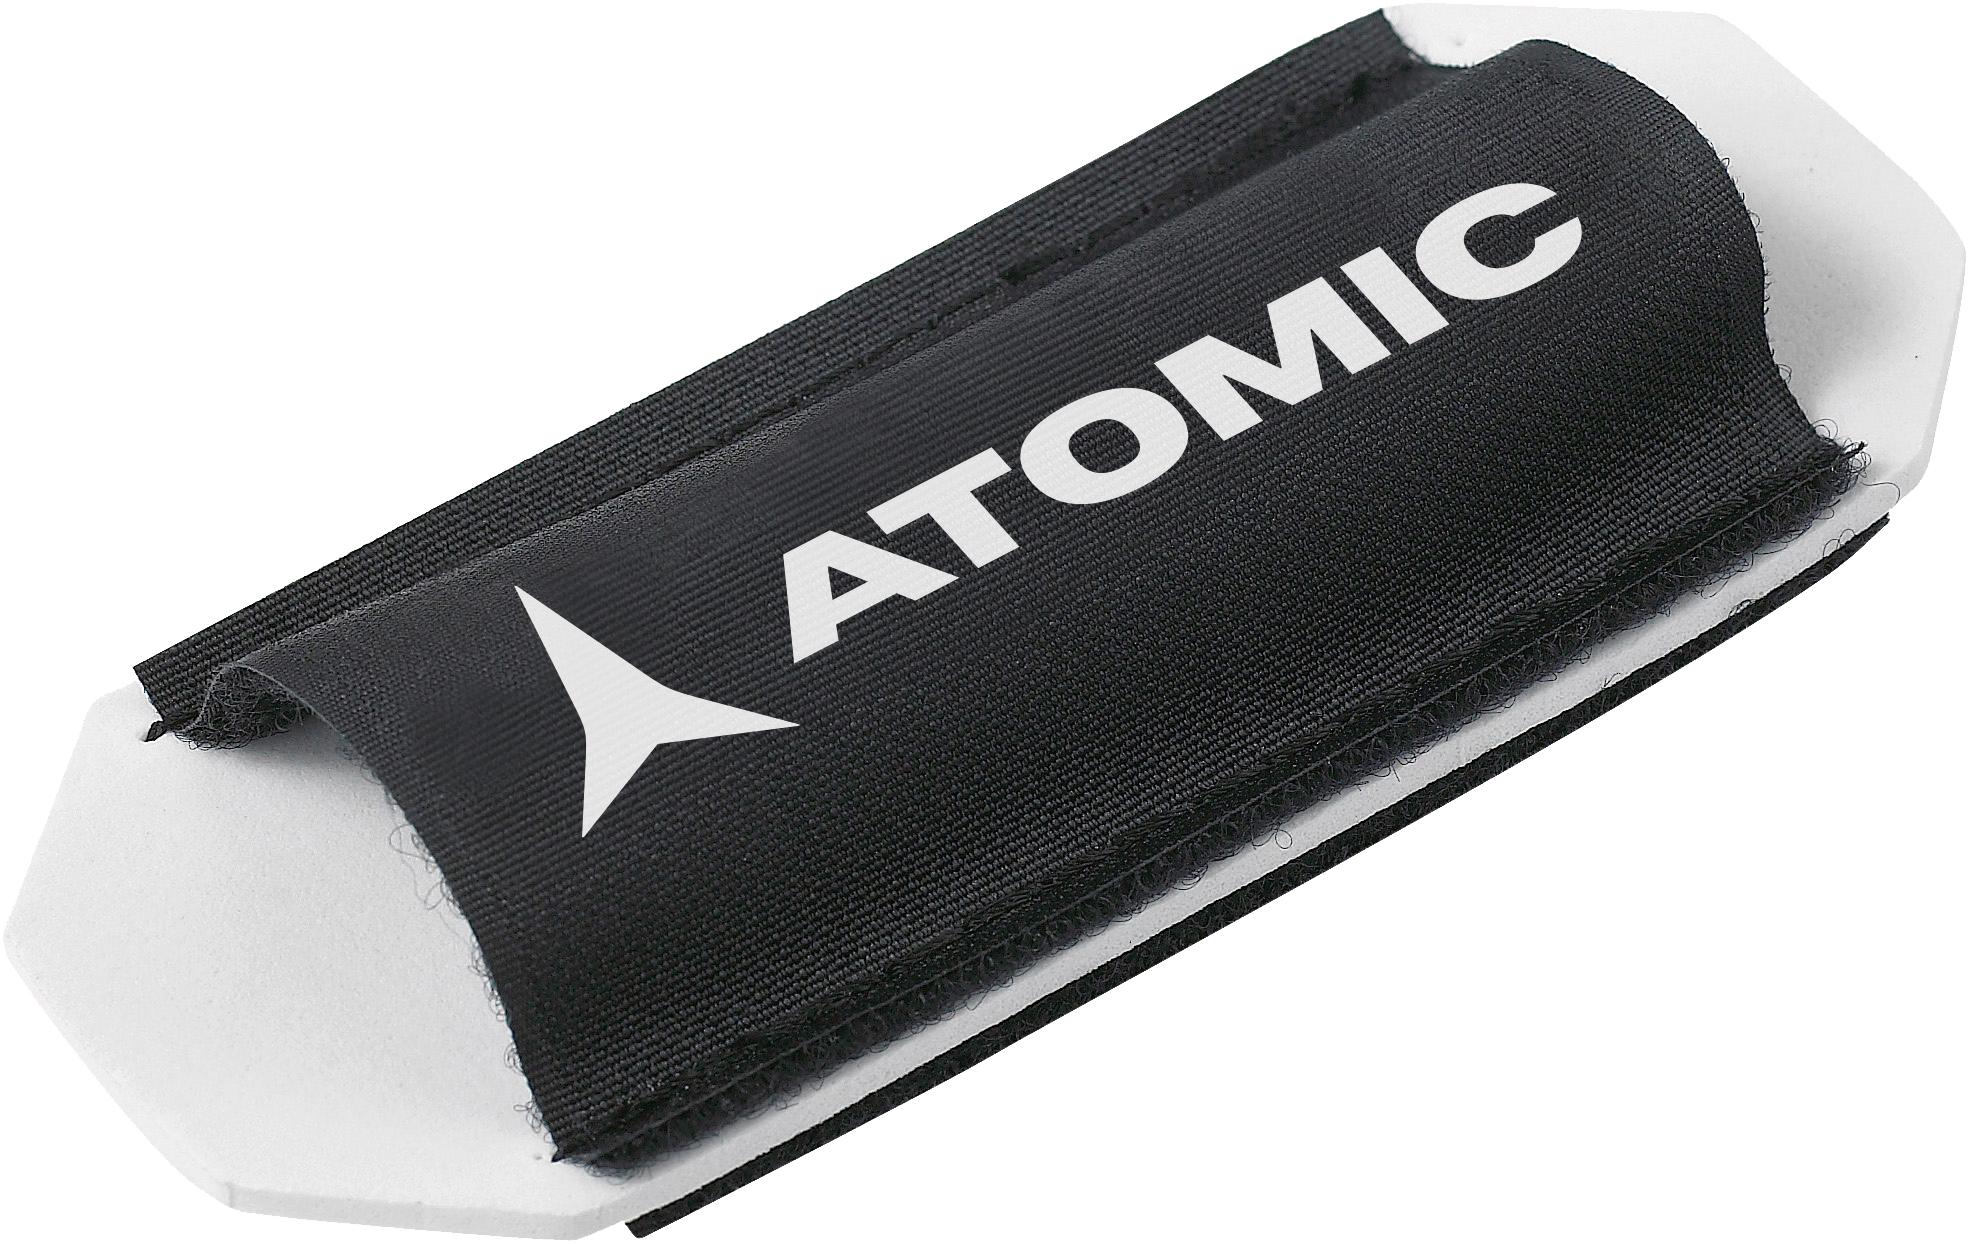 Atomic Манжеты для беговых лыж Atomic, 1 шт.